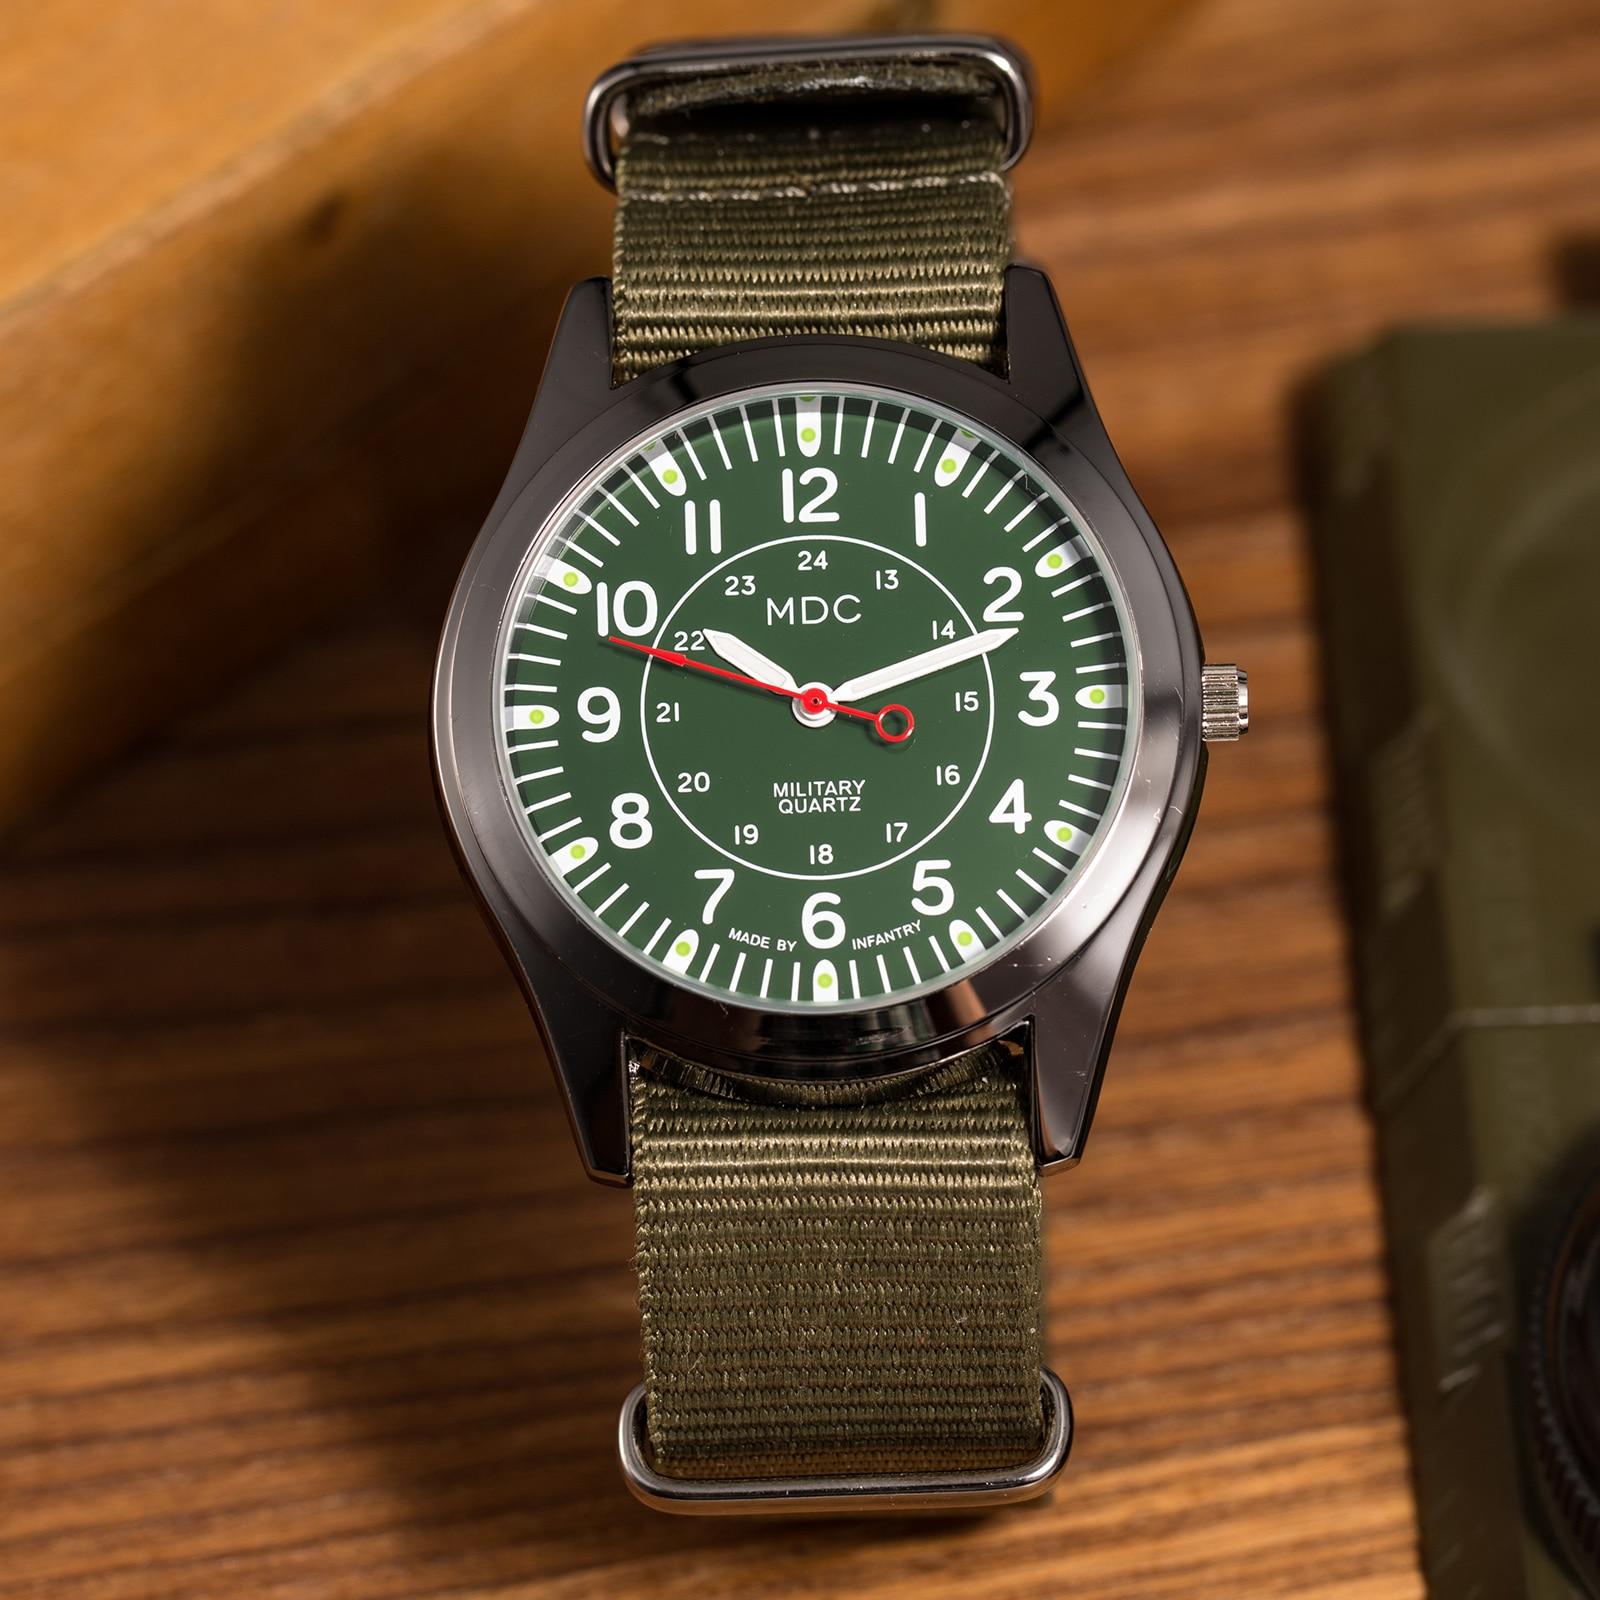 Mens Watches Top Brand Luxury 2020 MDC Military Quartz Watch For Men Luminous Thin Nato Strap Army Watch Men Relogio Masculino